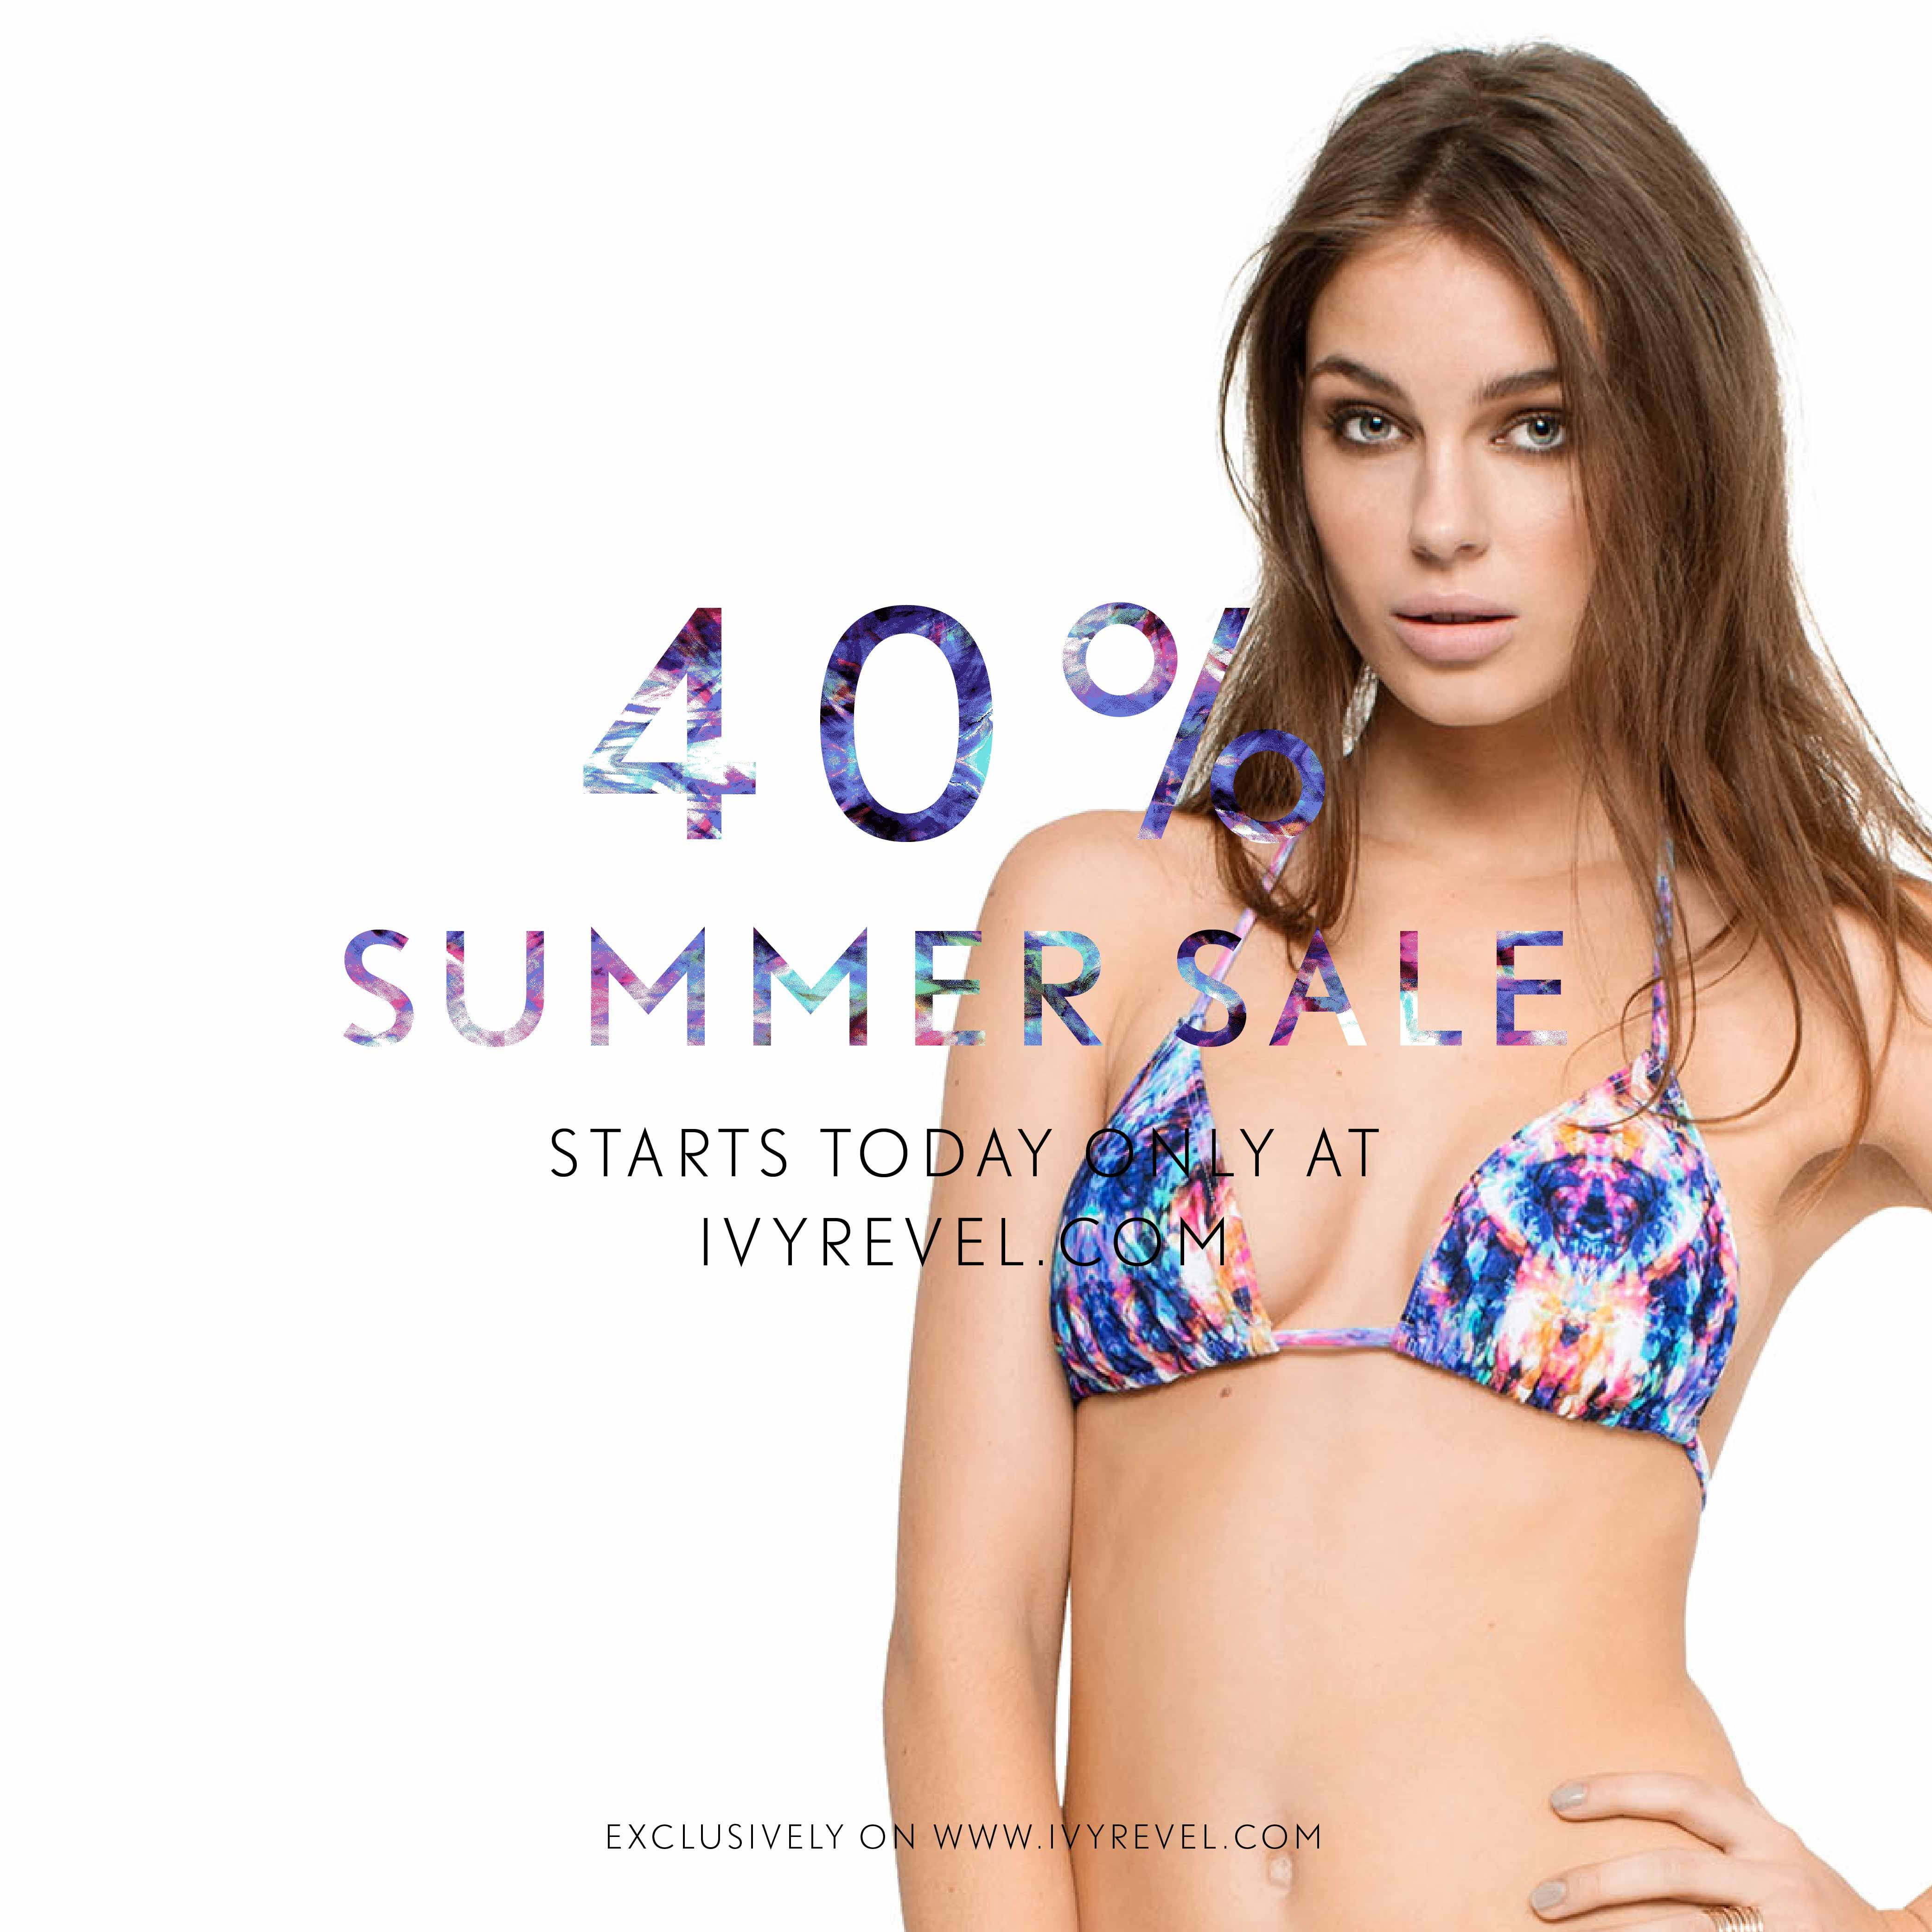 SUMMER SALE 40%_1000X1000px-01